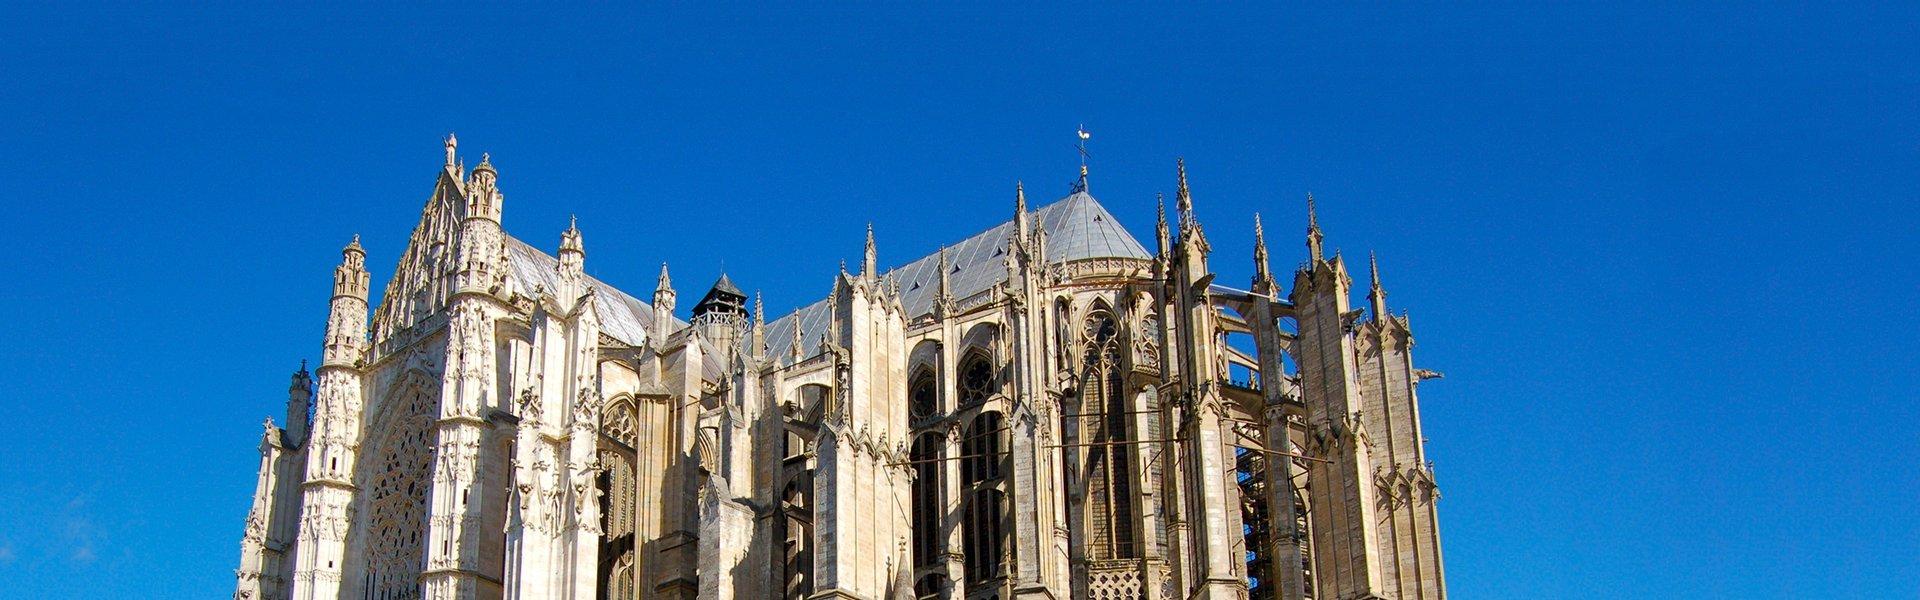 Kathedraal van Beauvais, Frankrijk